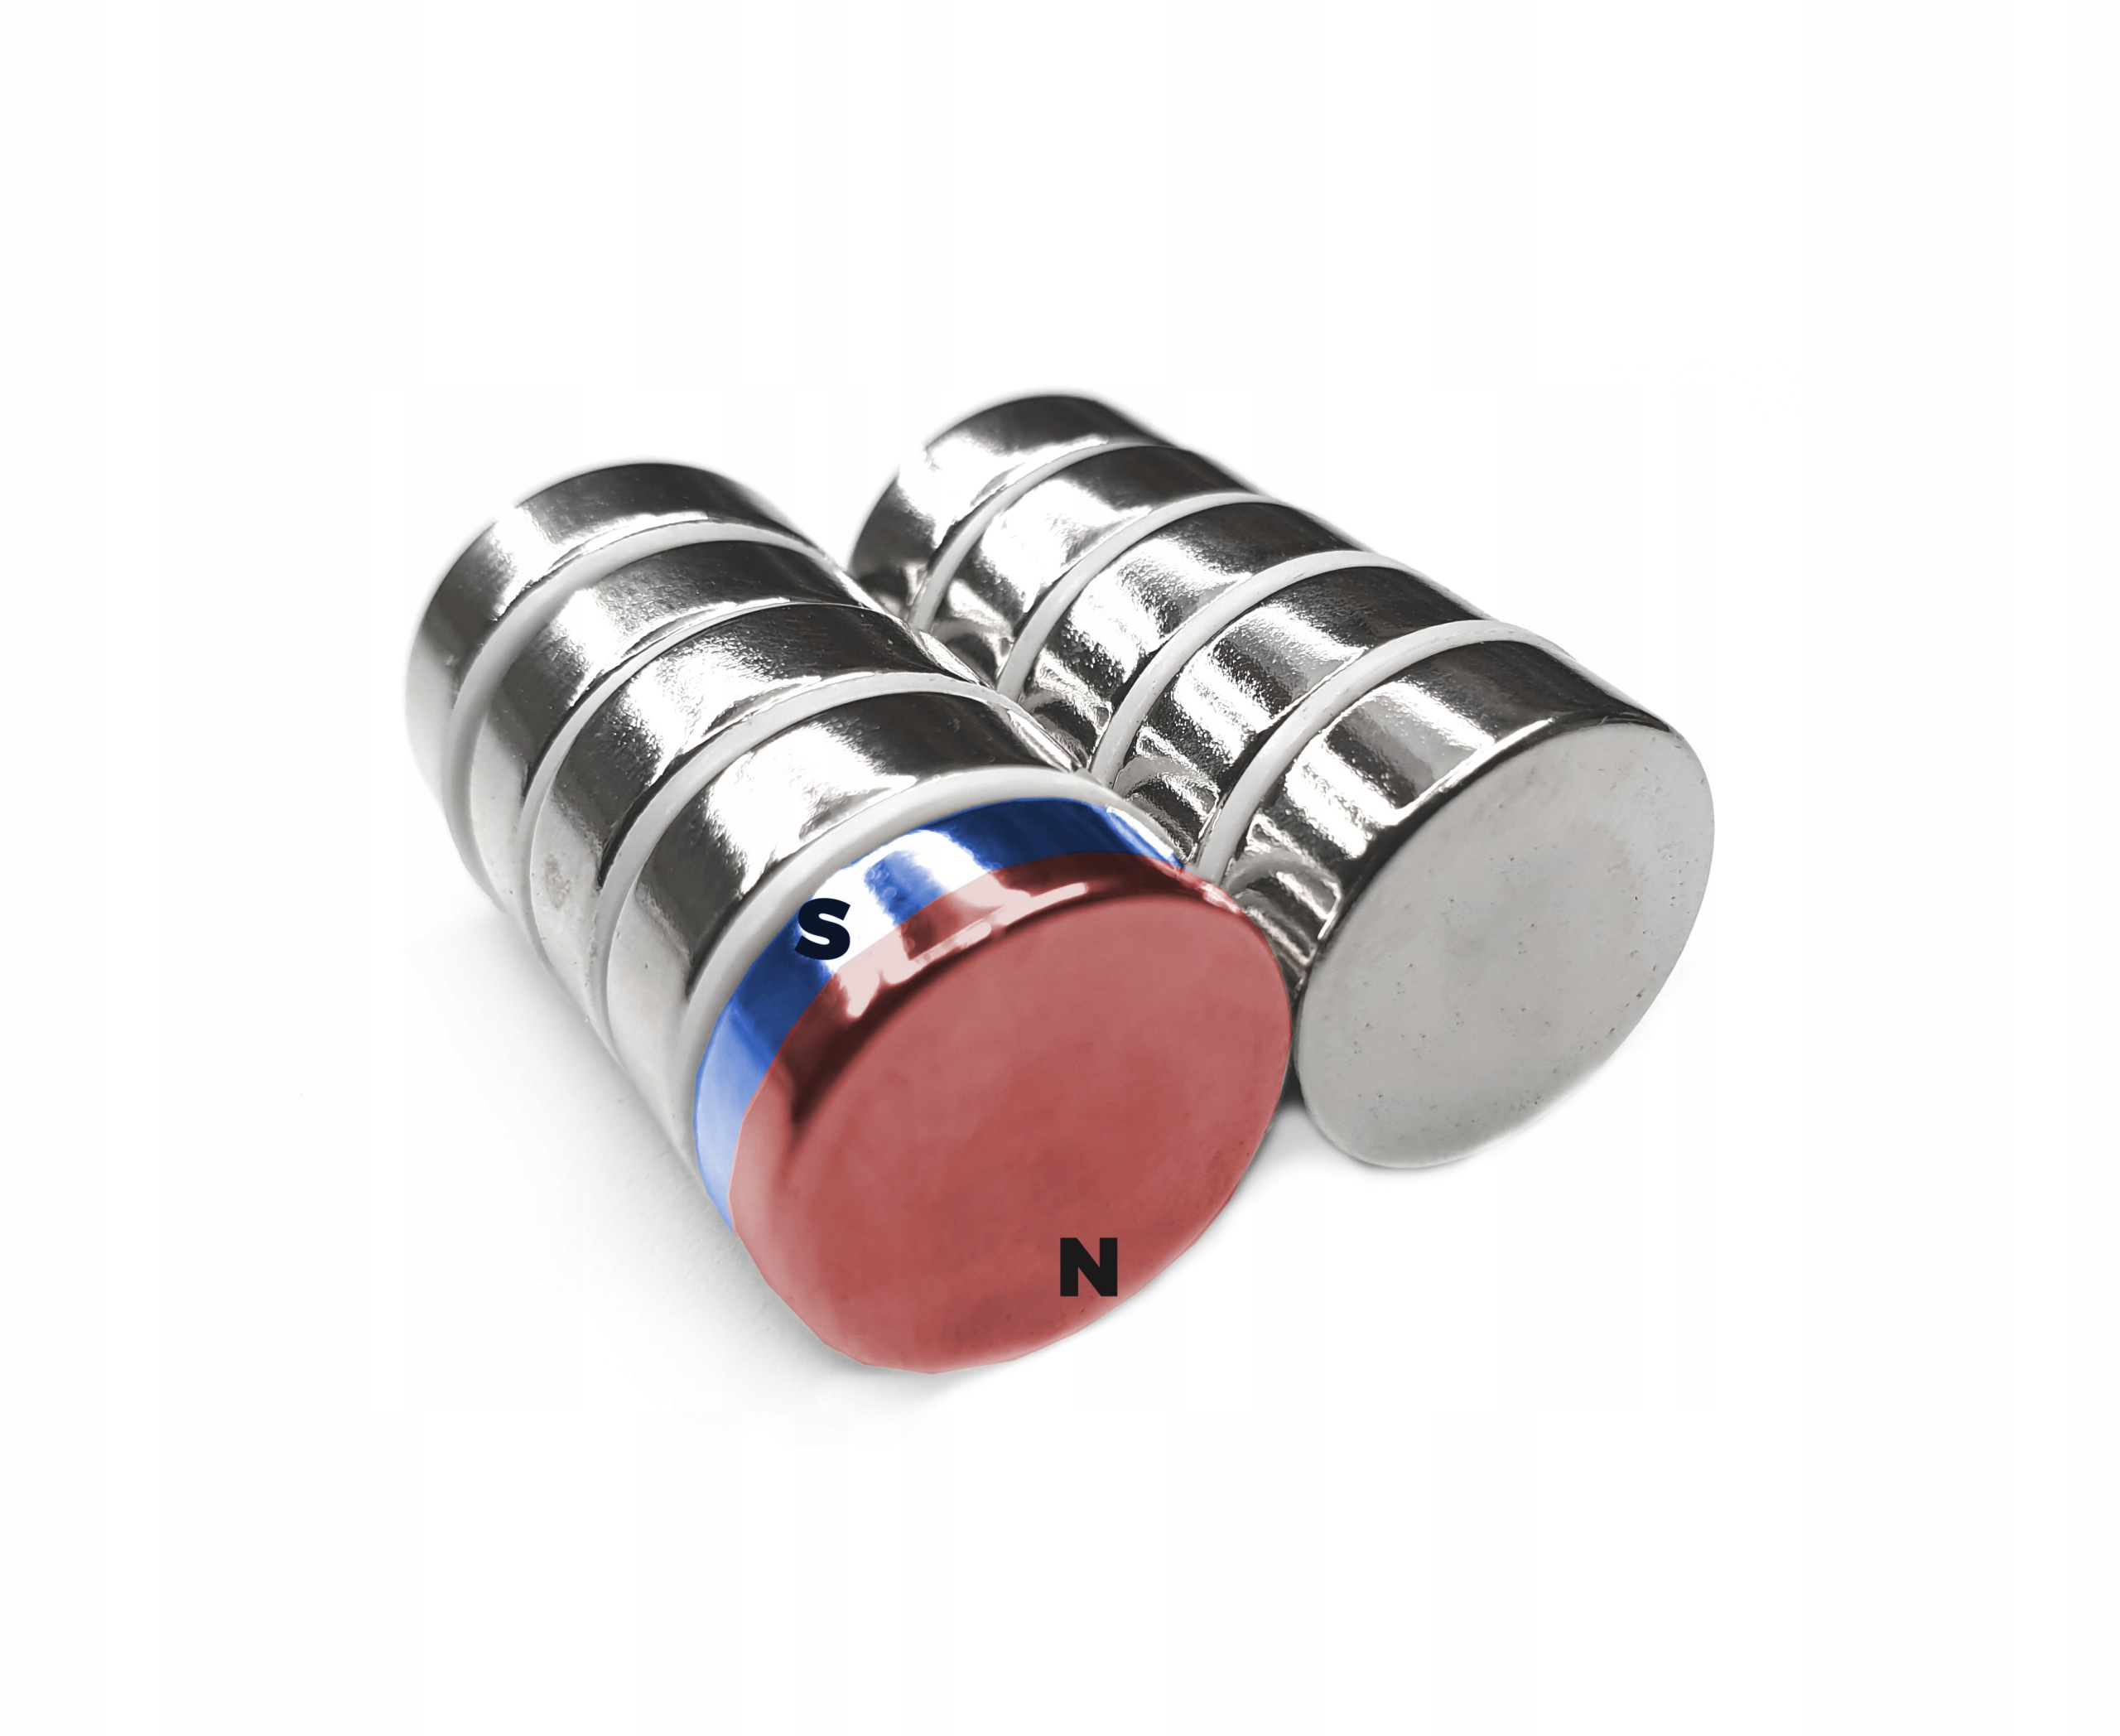 MAGNES NEODYMOWY MAGNESY 10x2 mm 10 szt. Symbol materiału N42